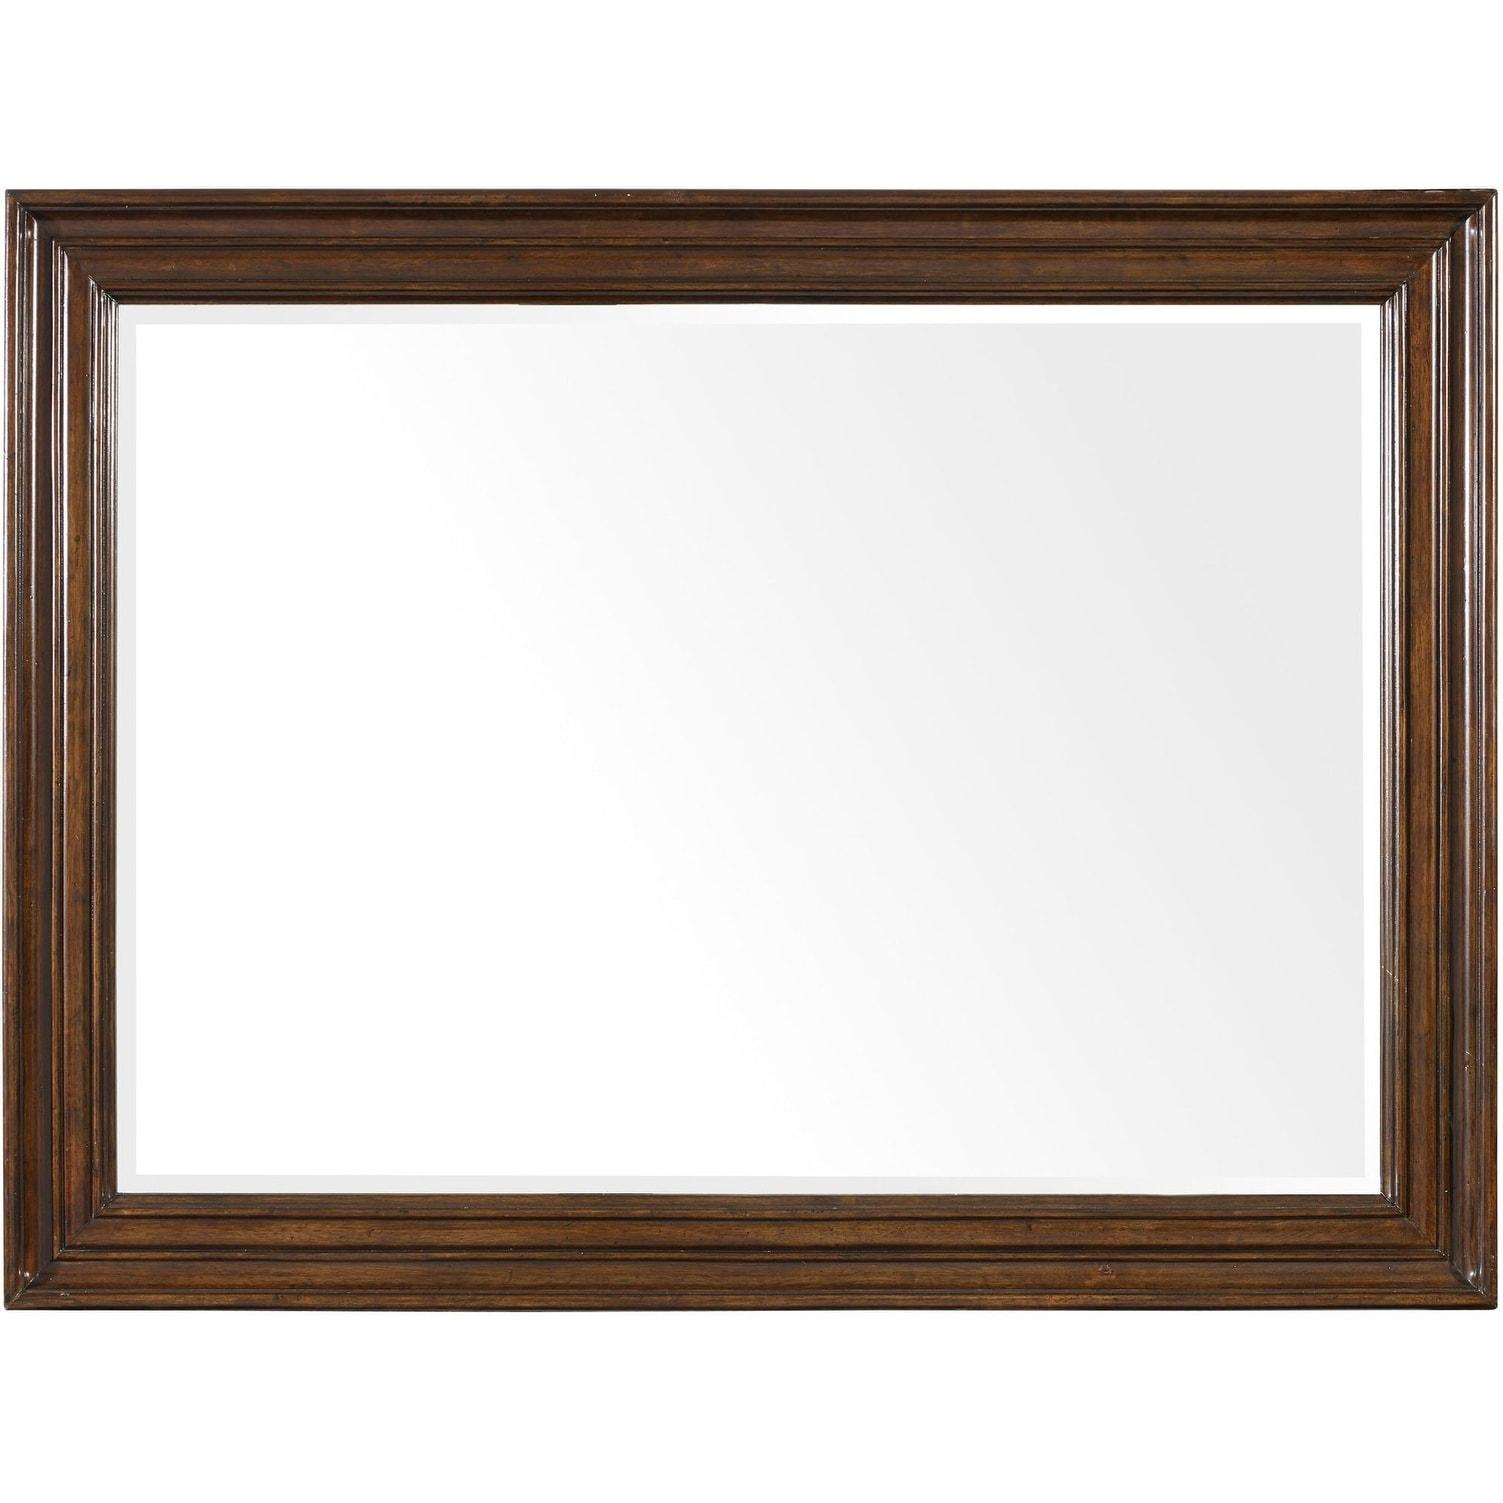 Hooker Furniture 5381 90008 46 1 2 X 34 1 4 Rectangular Framed Rich Traditional Mahogany Overstock 18831309